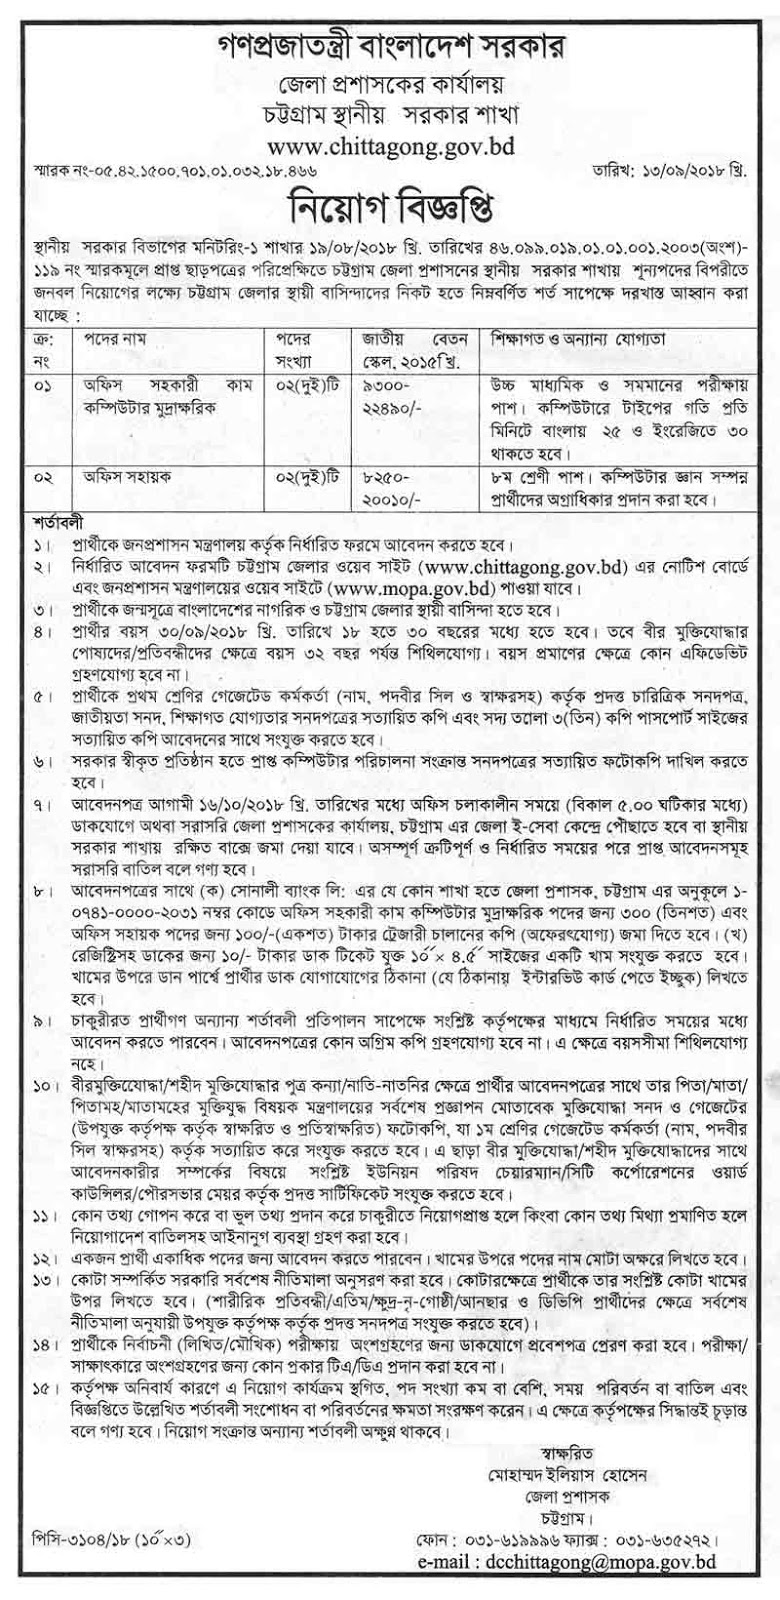 Chittagong Council